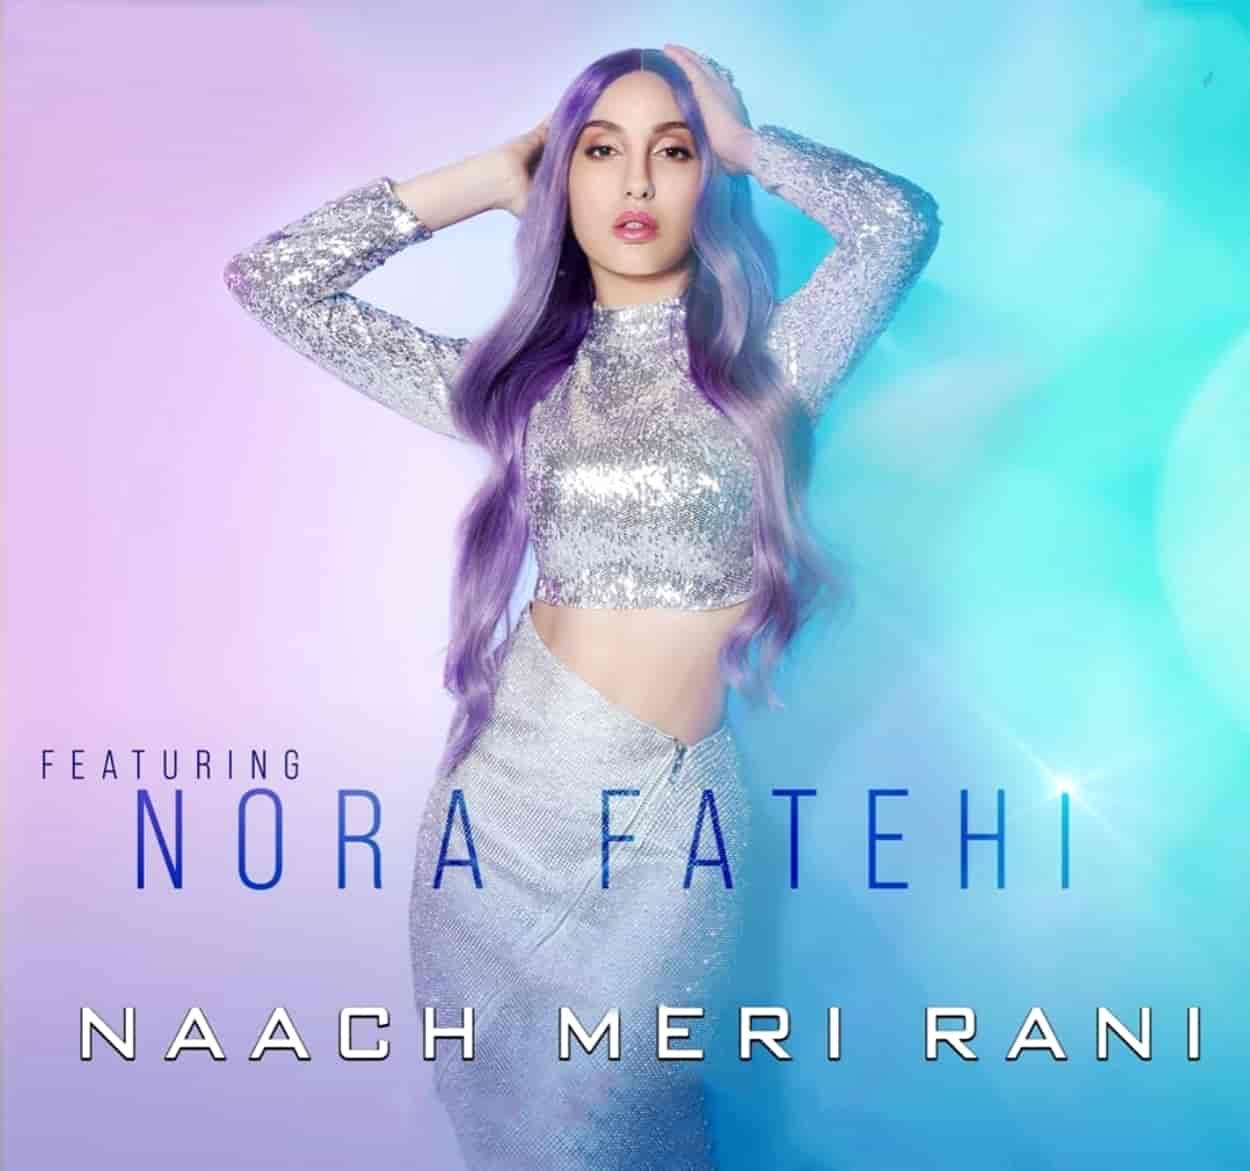 Naach Meri Rani Dance Song Image Features Nora Fatehi and Guru Randhawa